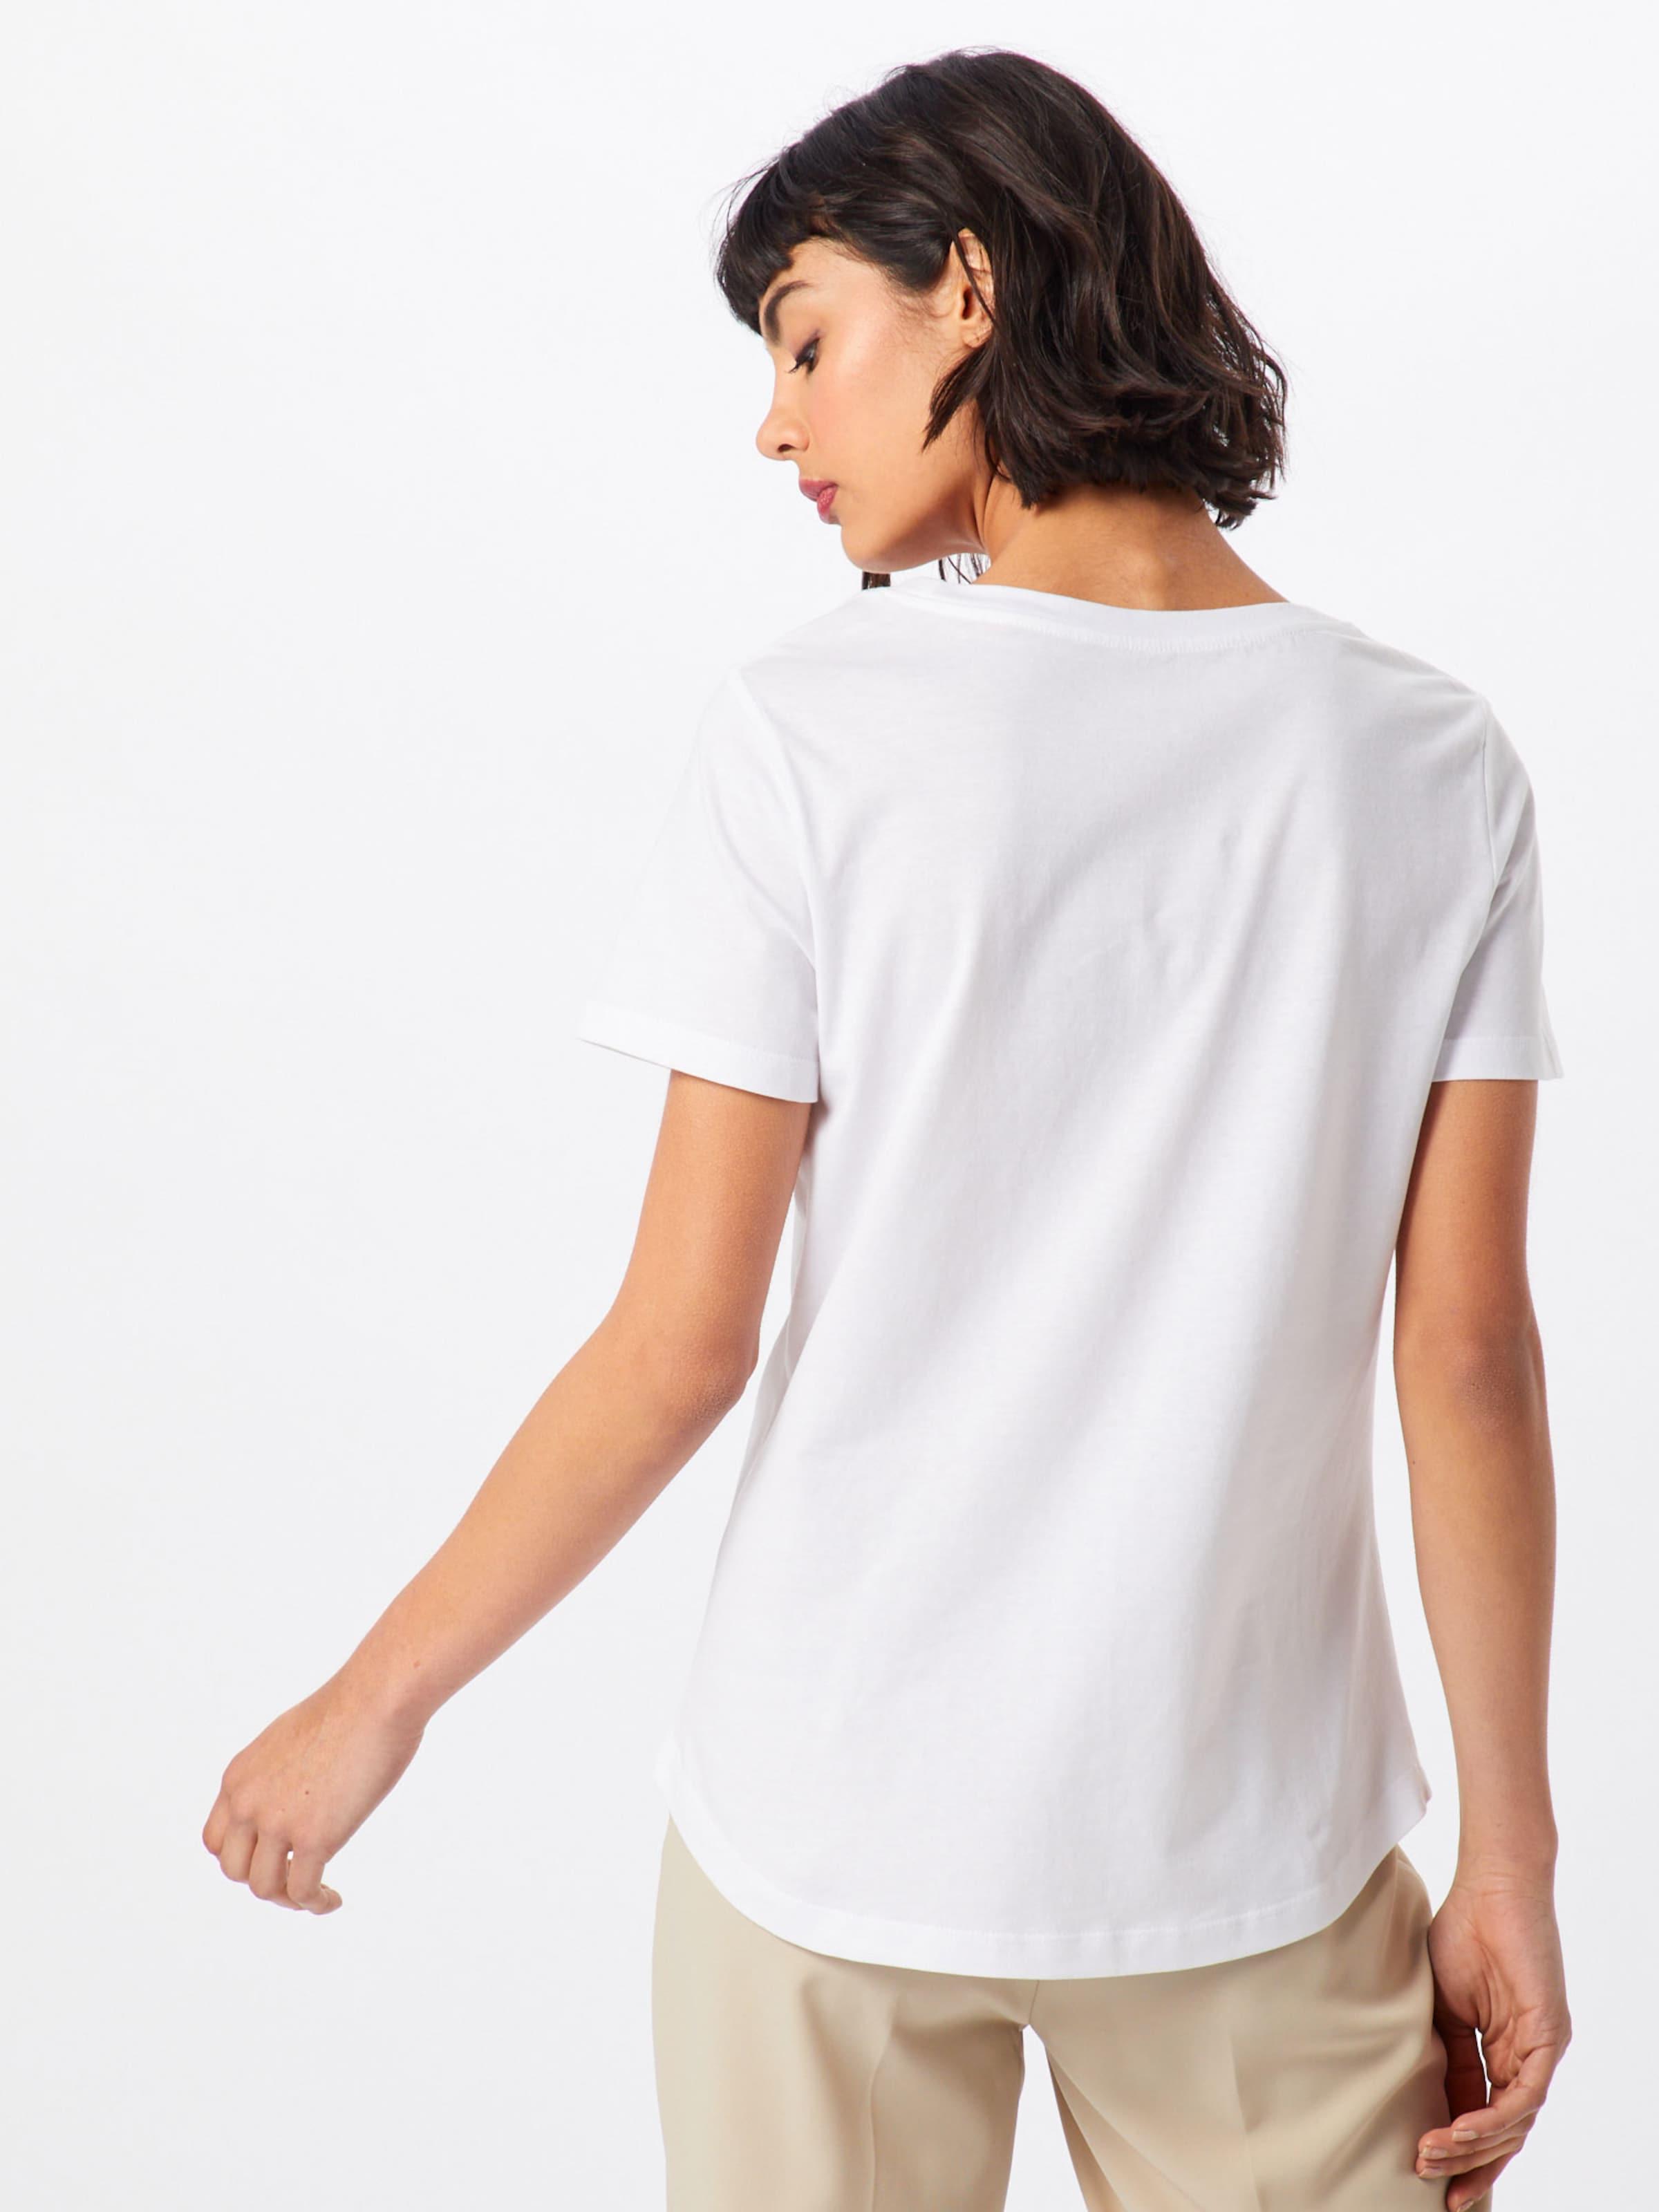 Blanc T oliver shirt S Red Label En eCxQrdBoW